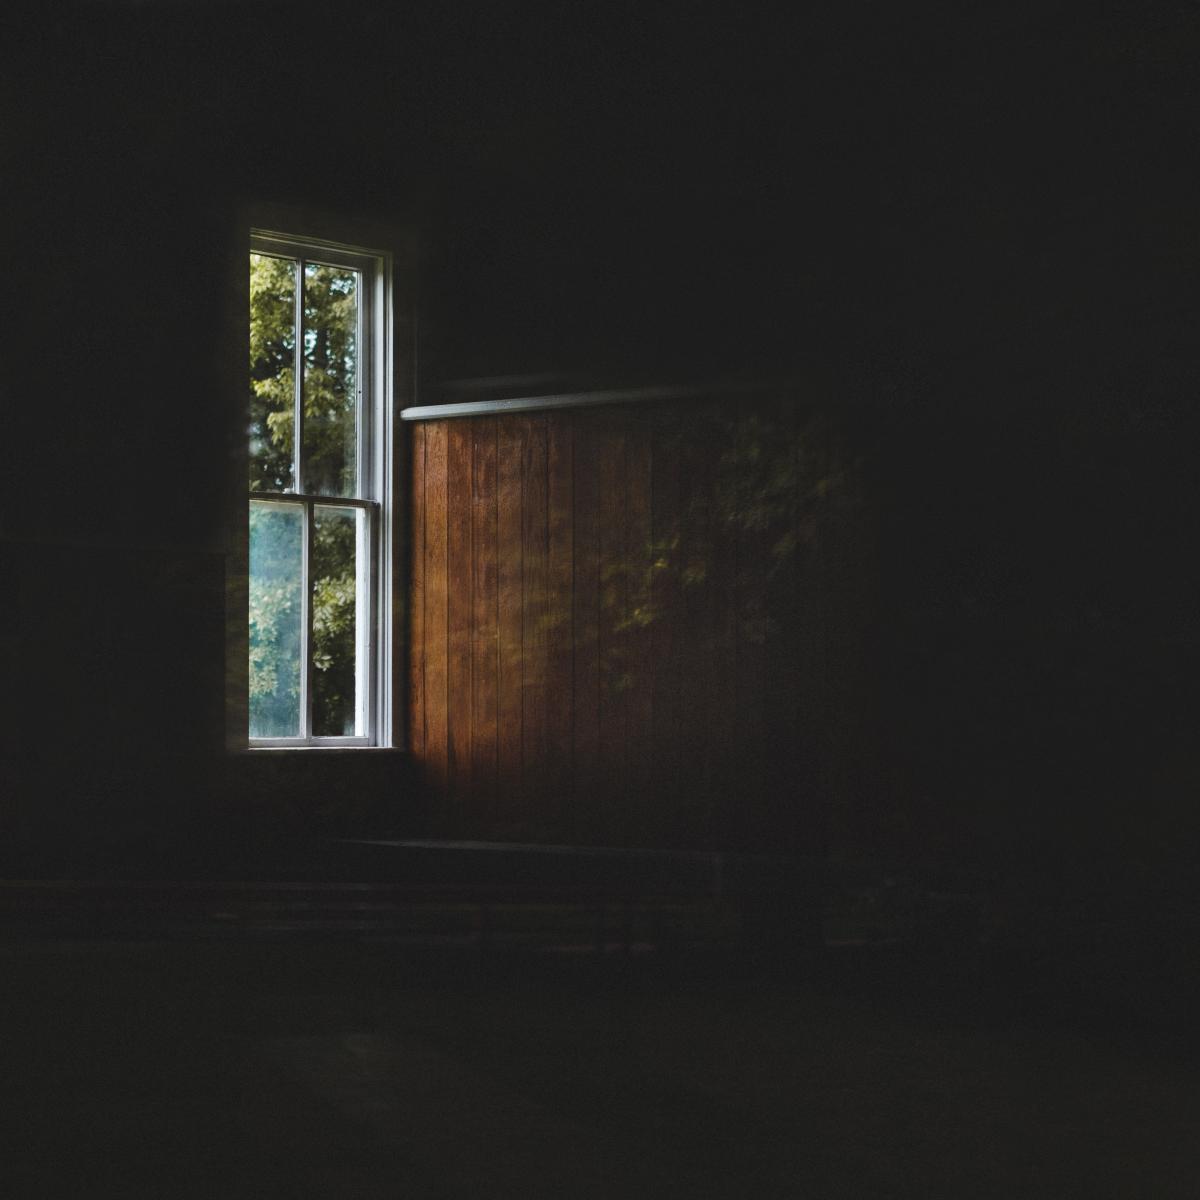 Window Wall Architecture